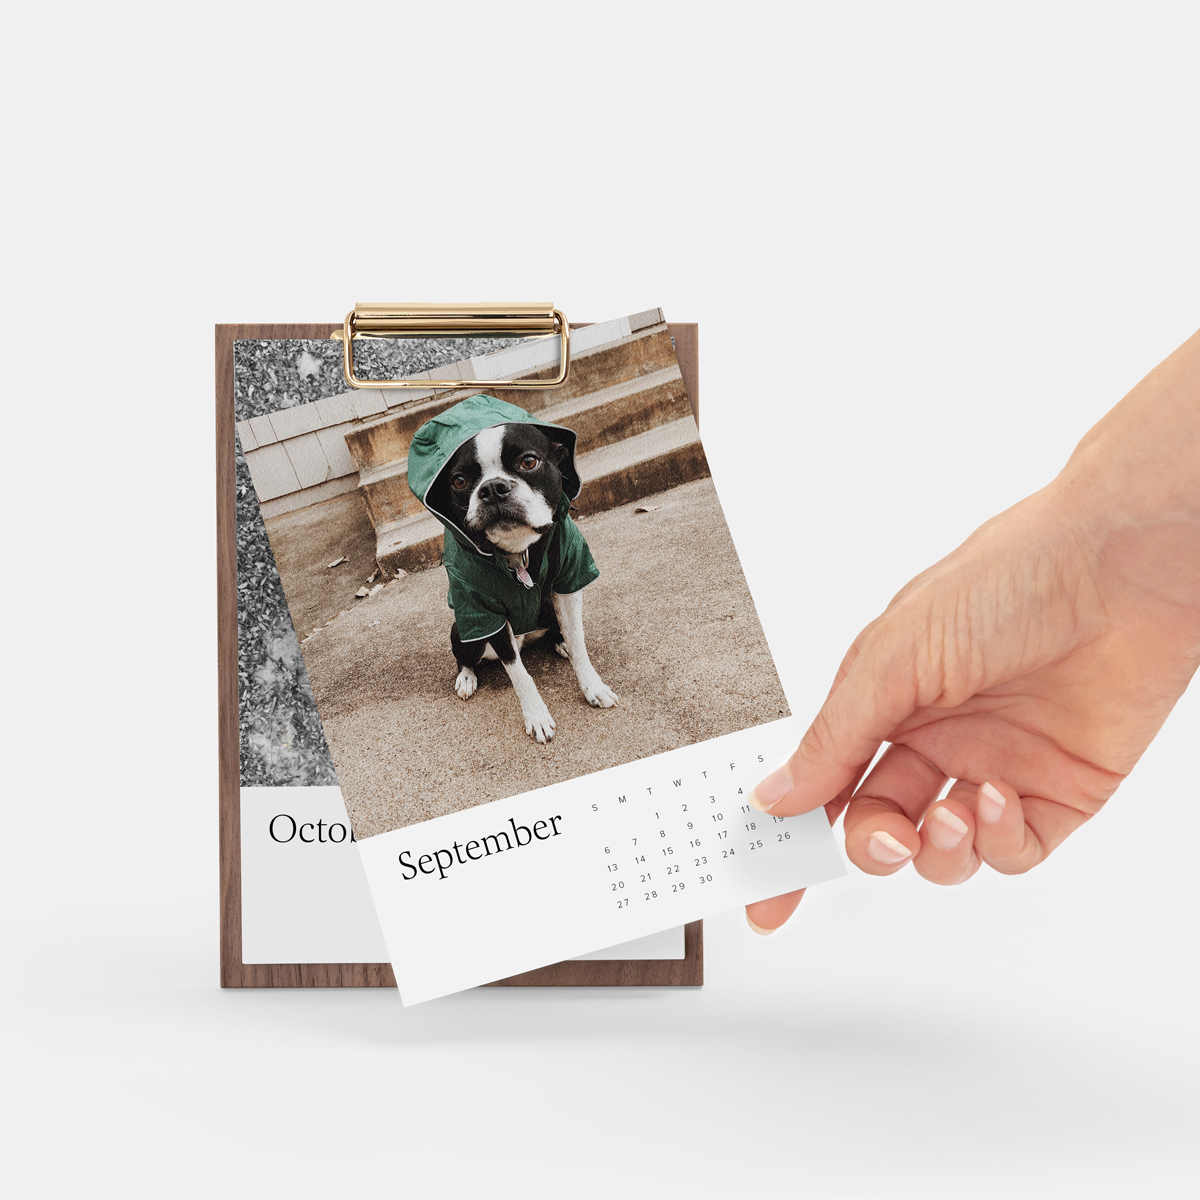 wood desktop calendar set to September featuring photo of cute dog wearing jacket